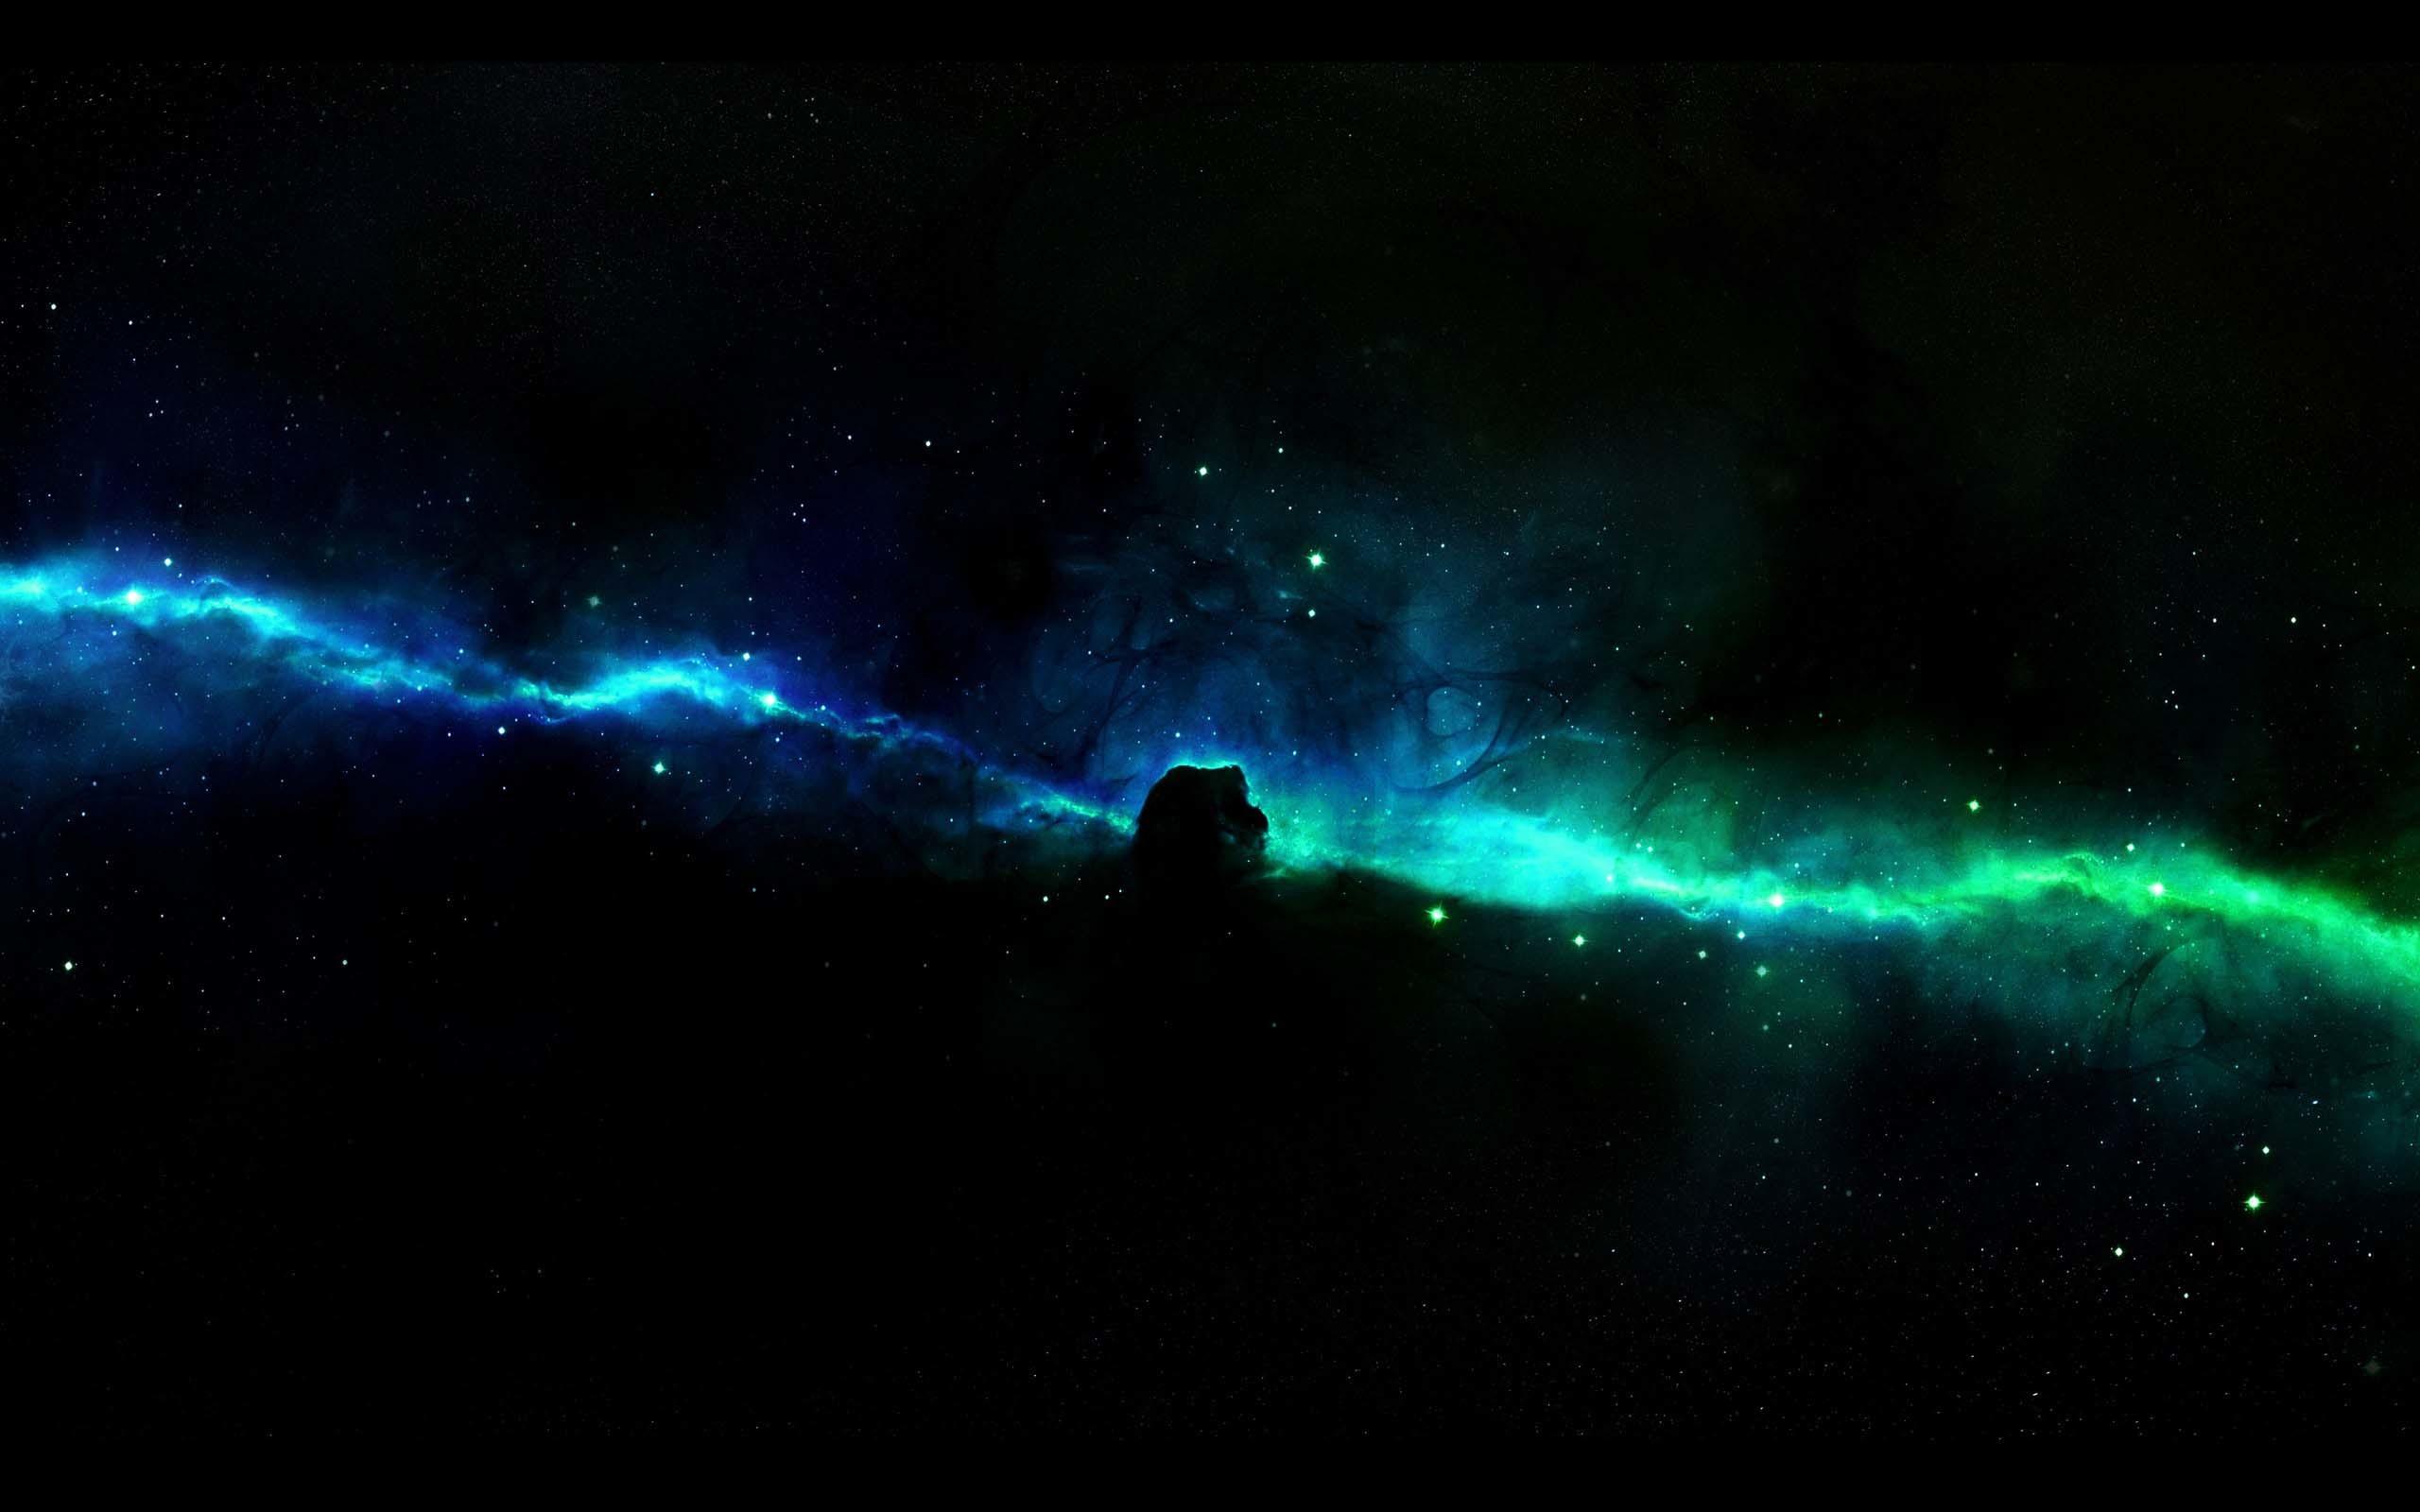 space-wallpaper-dark-blue-space-1024×640